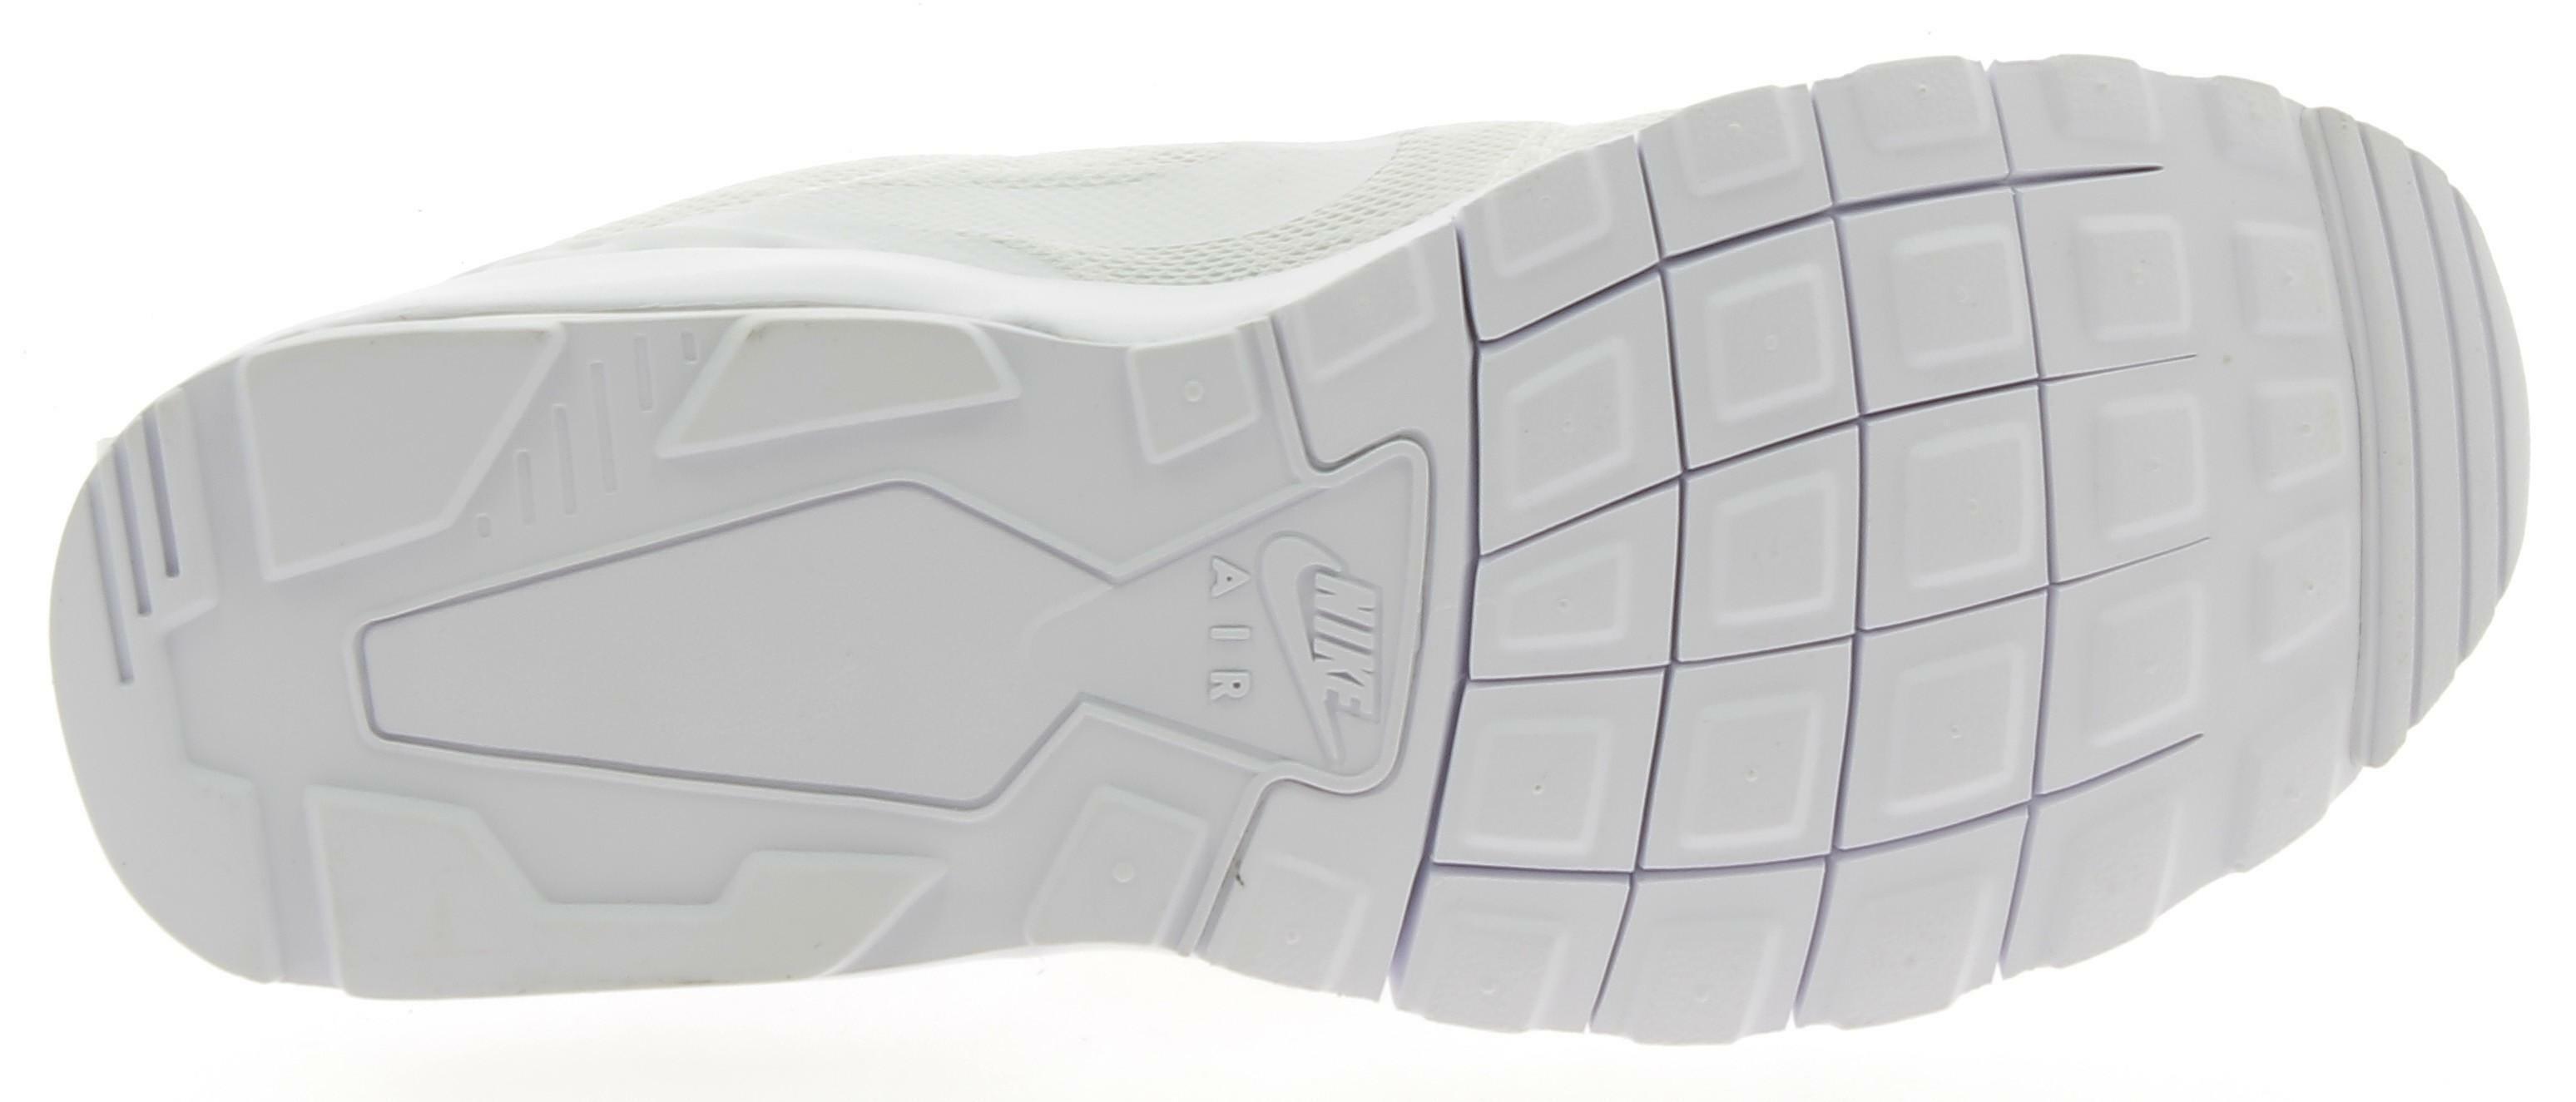 nike nike air max motion lw se scarpe sportive donna bianche 844895101